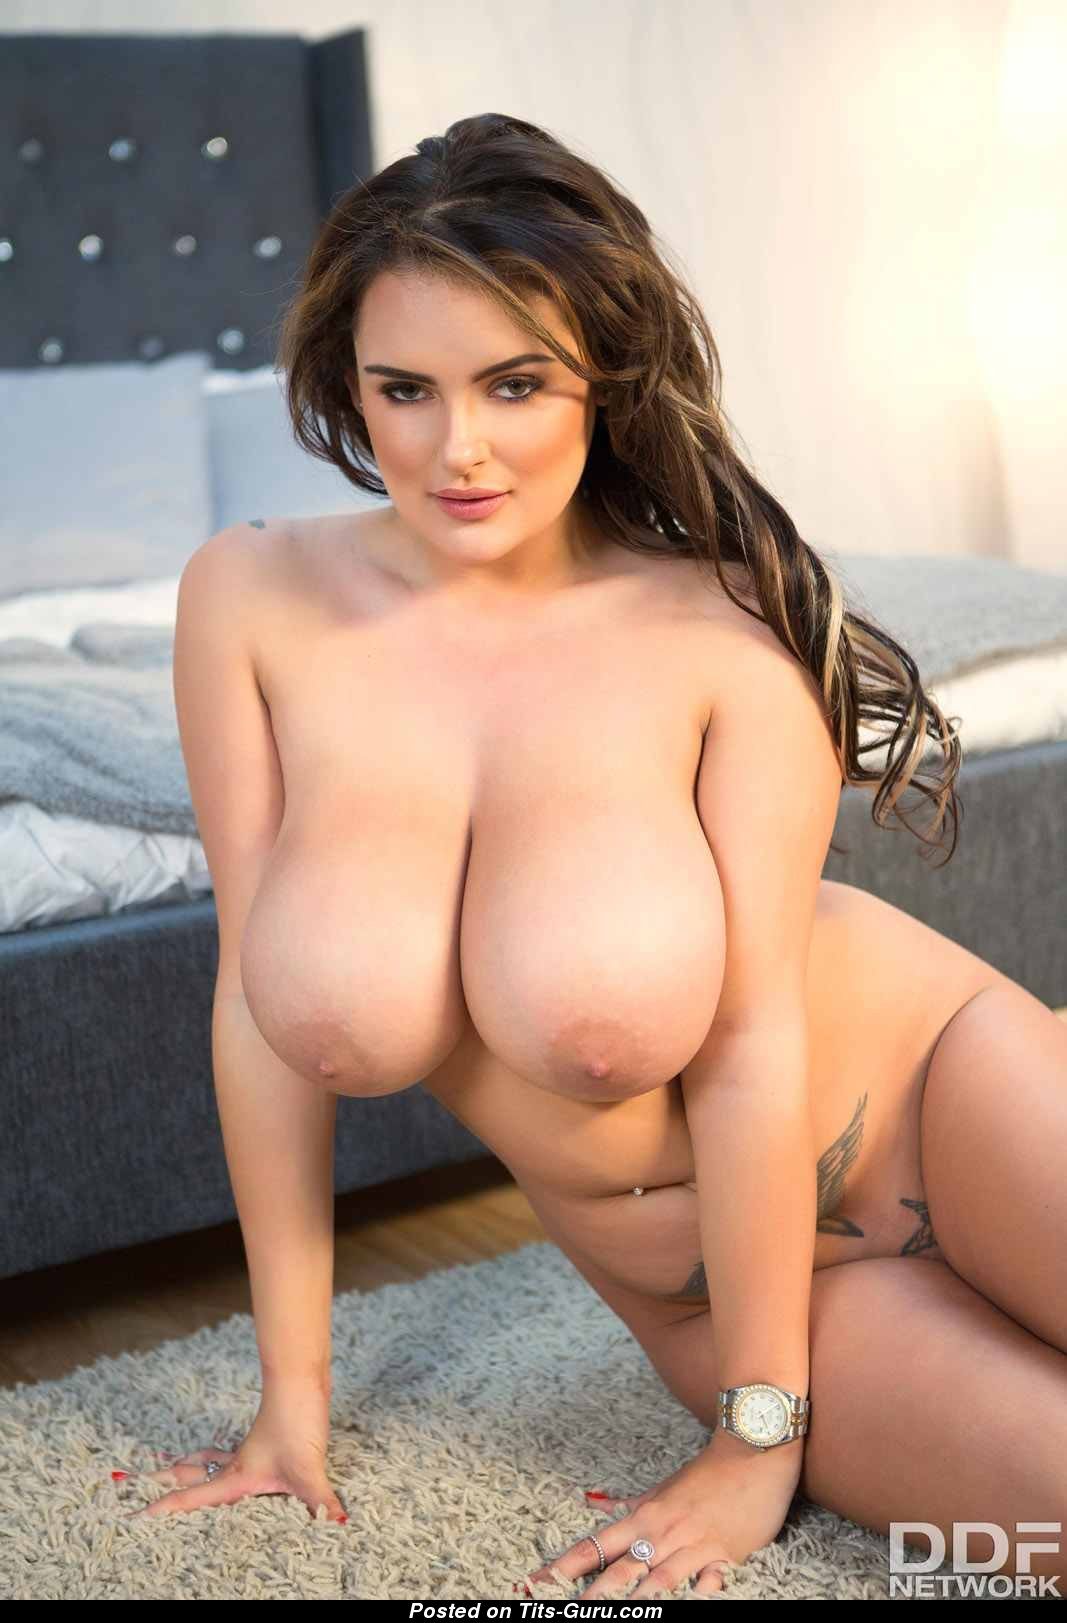 Huge tits pix-4331